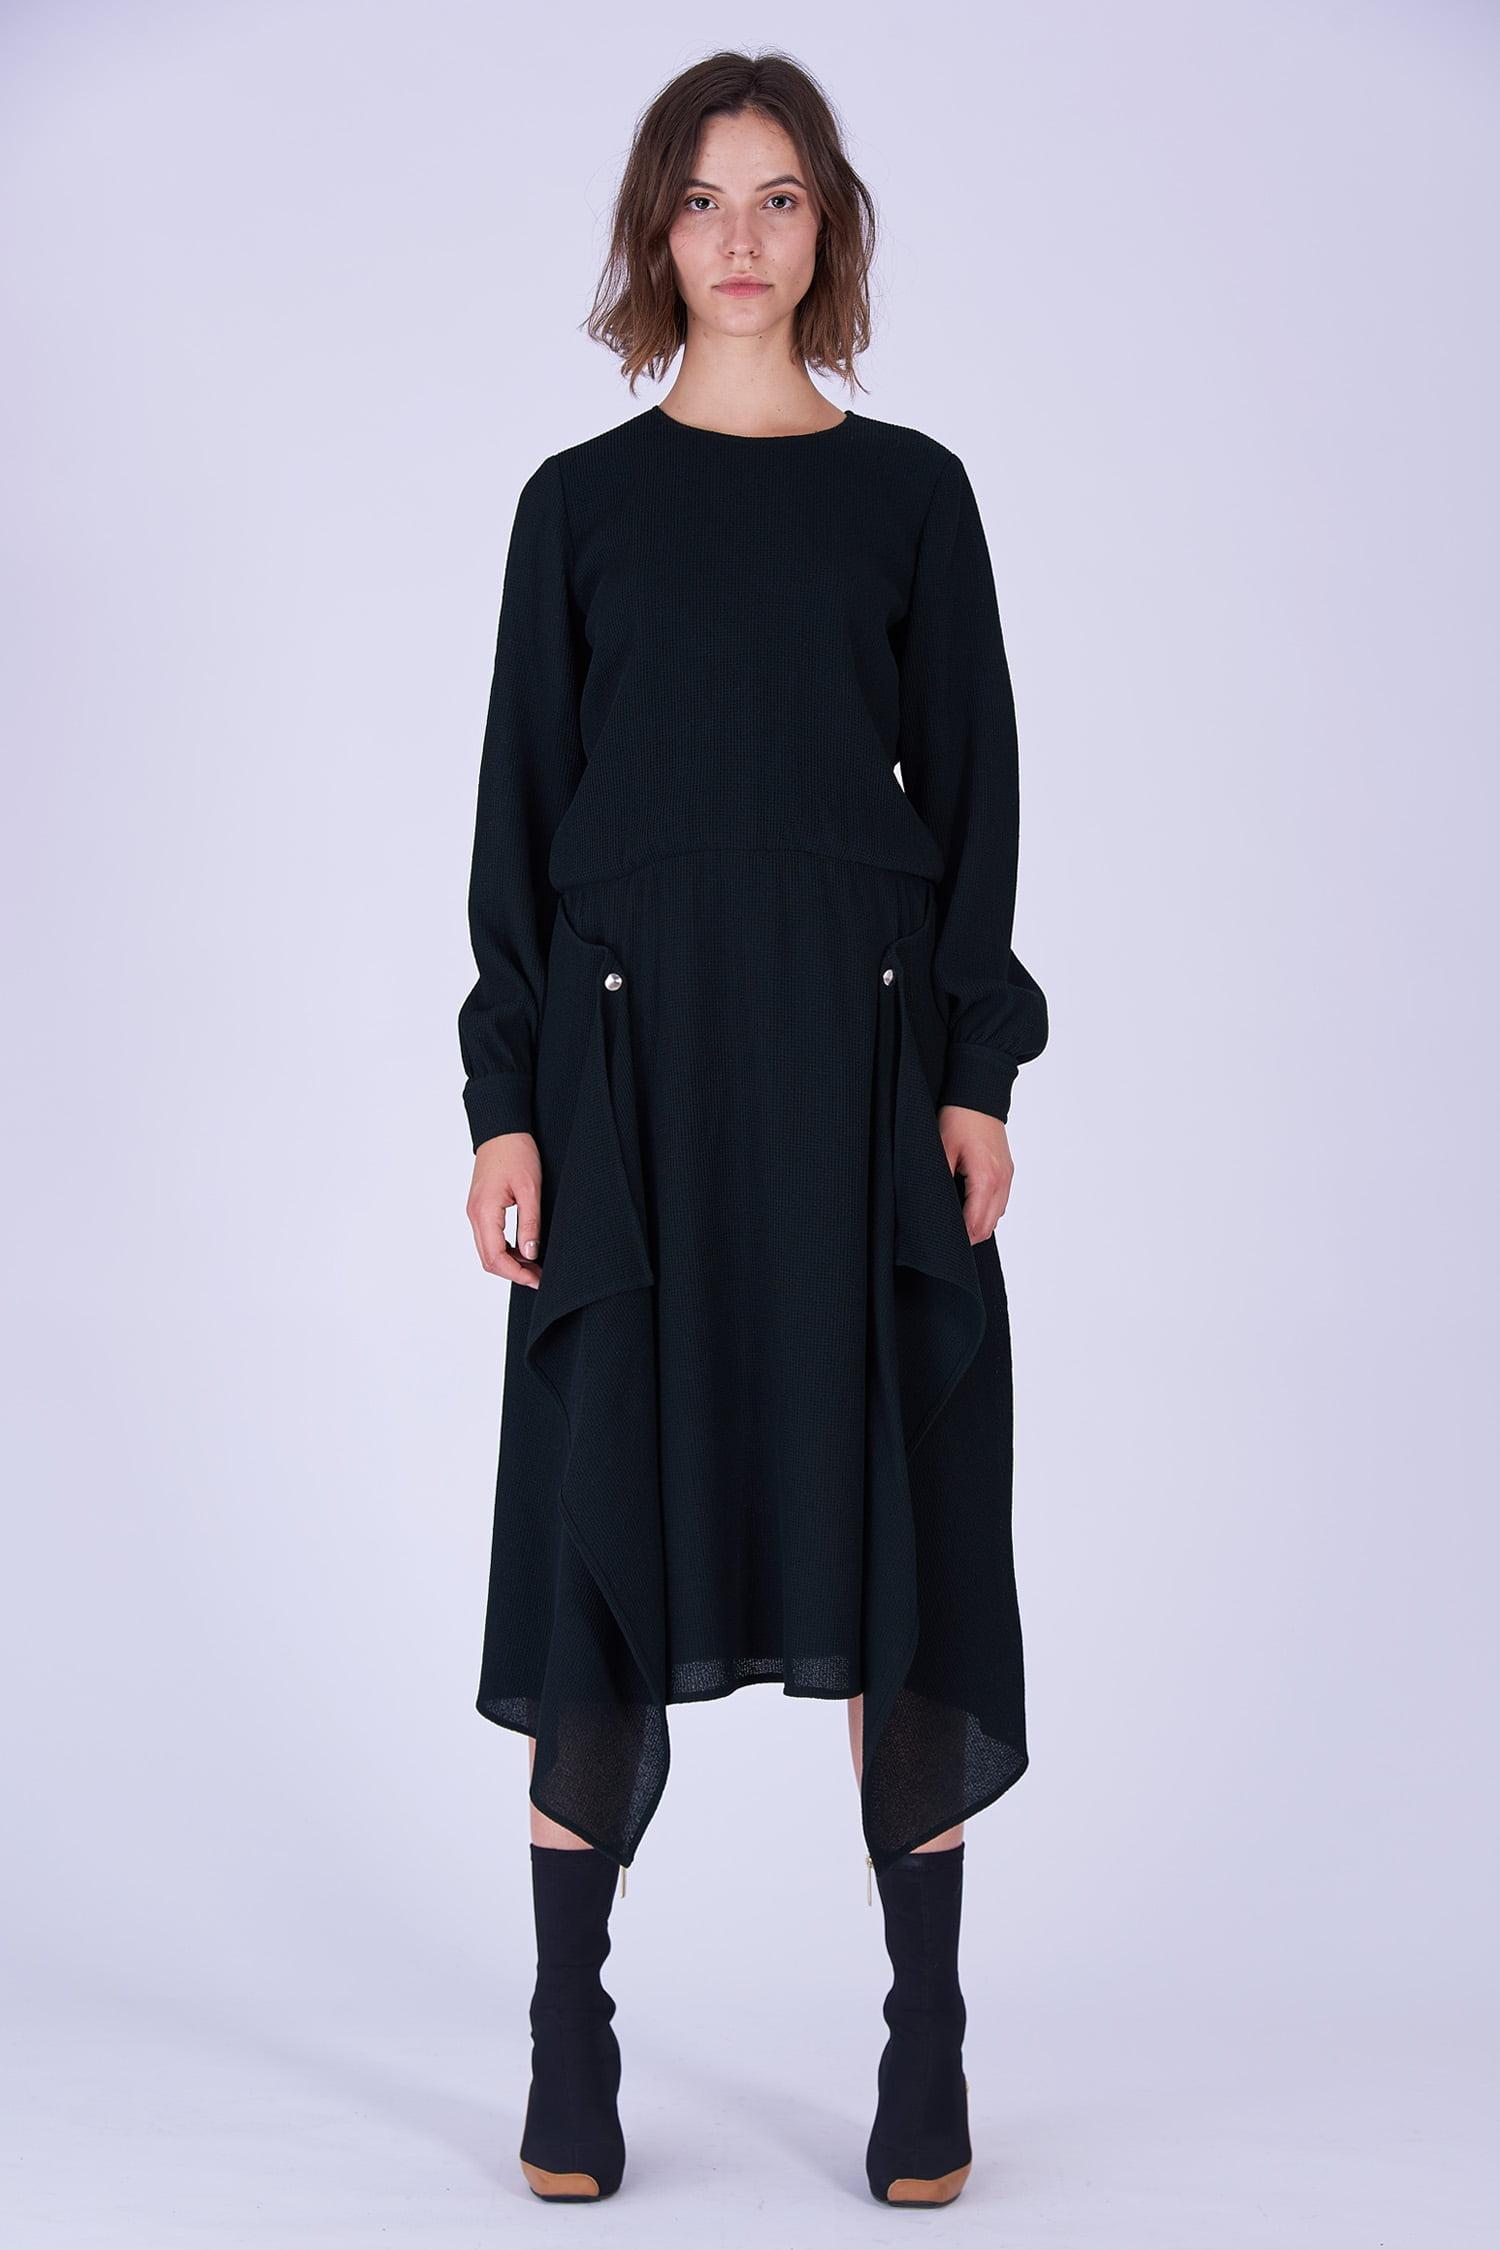 Acephala Fw19 20 Black Midi Draped Woolen Dress Czarna Sukienka Welniana Drapowana Front 1